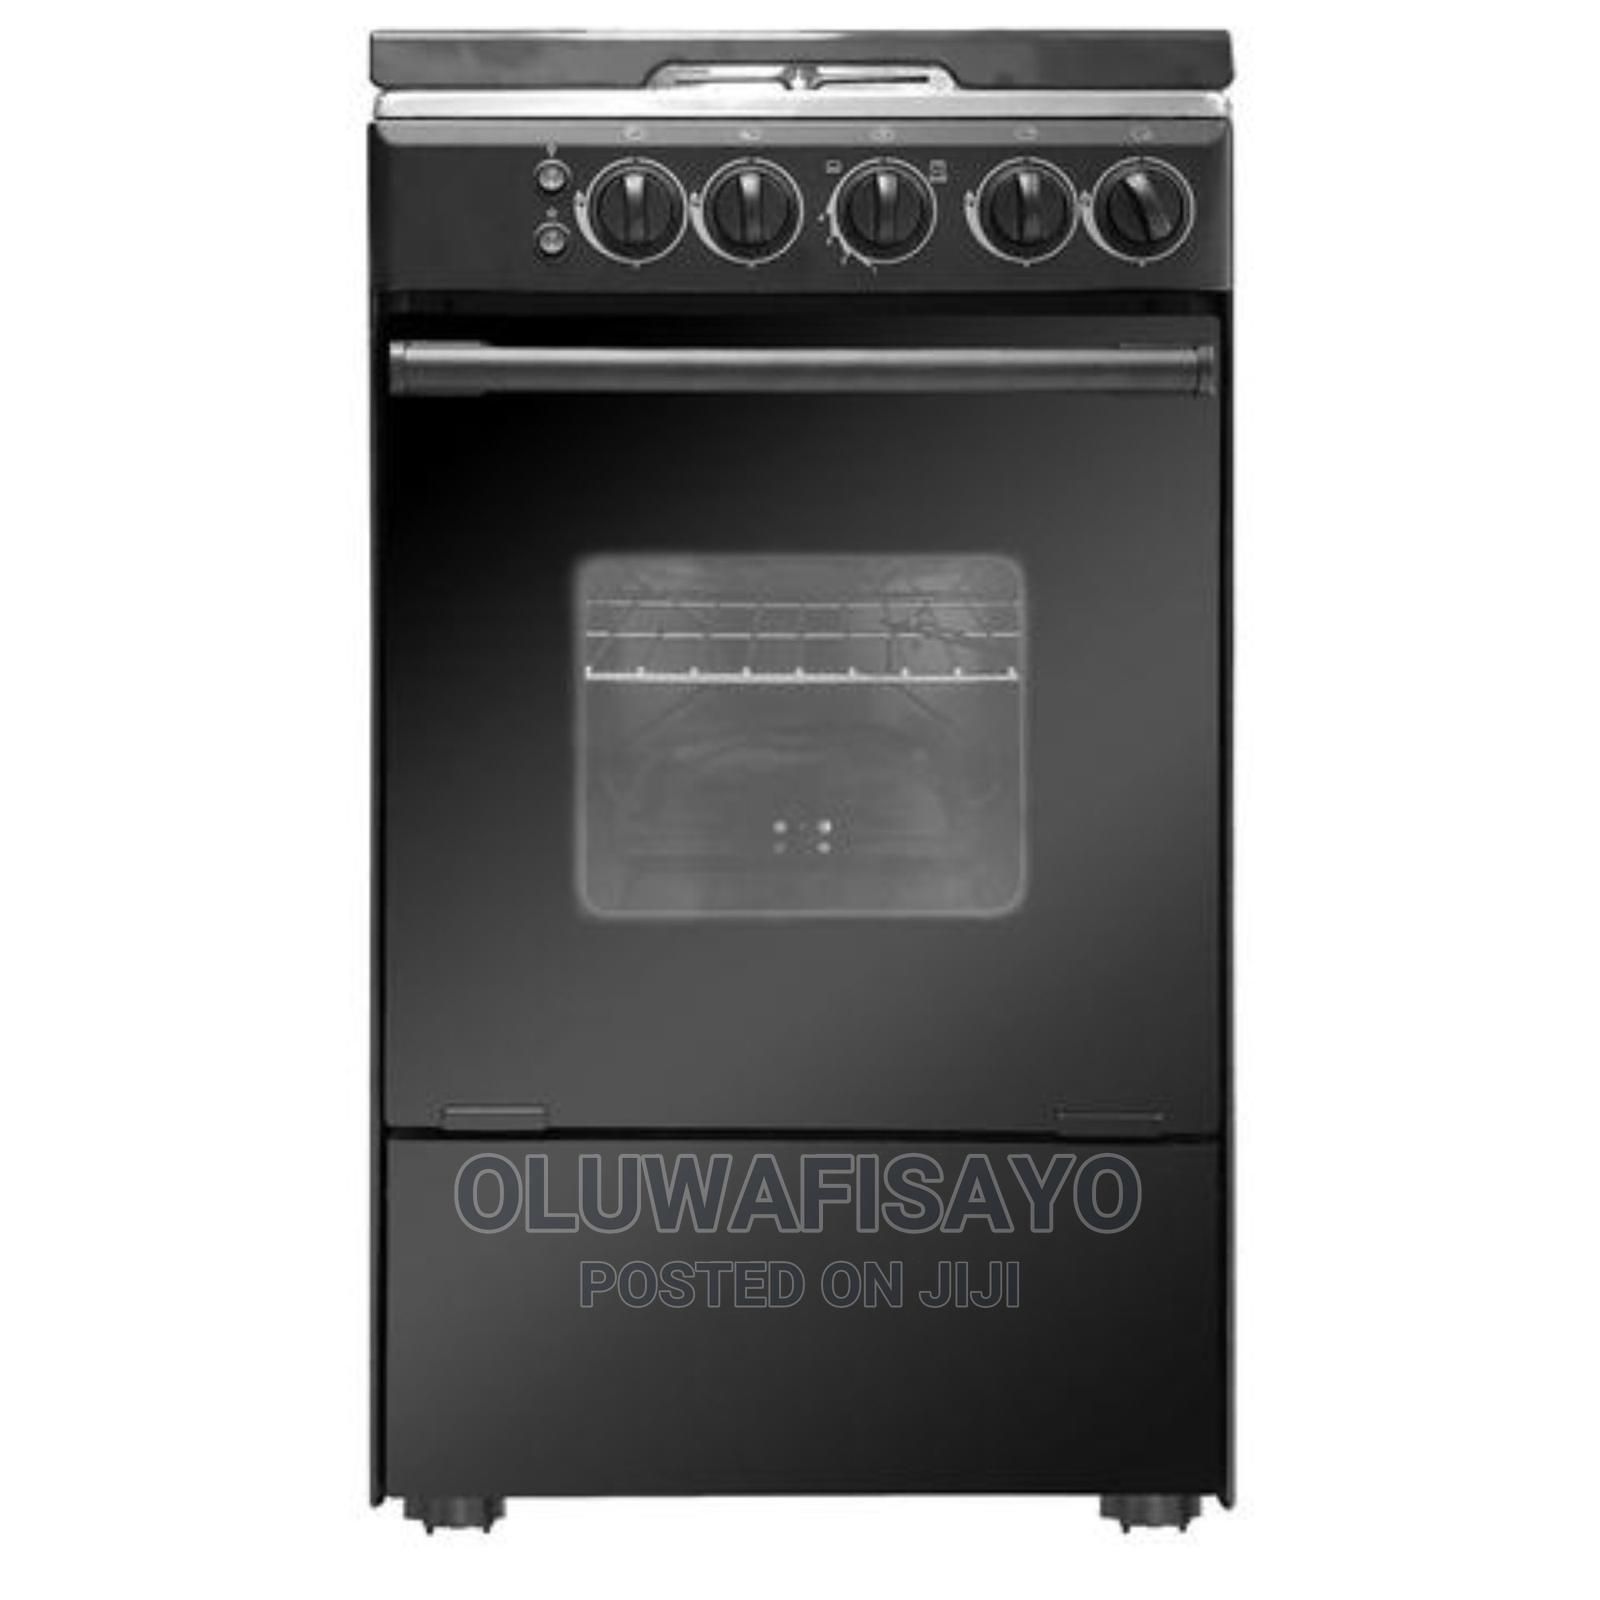 Midea 4 Burner Gas Cooker + Oven + Grill, 20bmg4g007-B